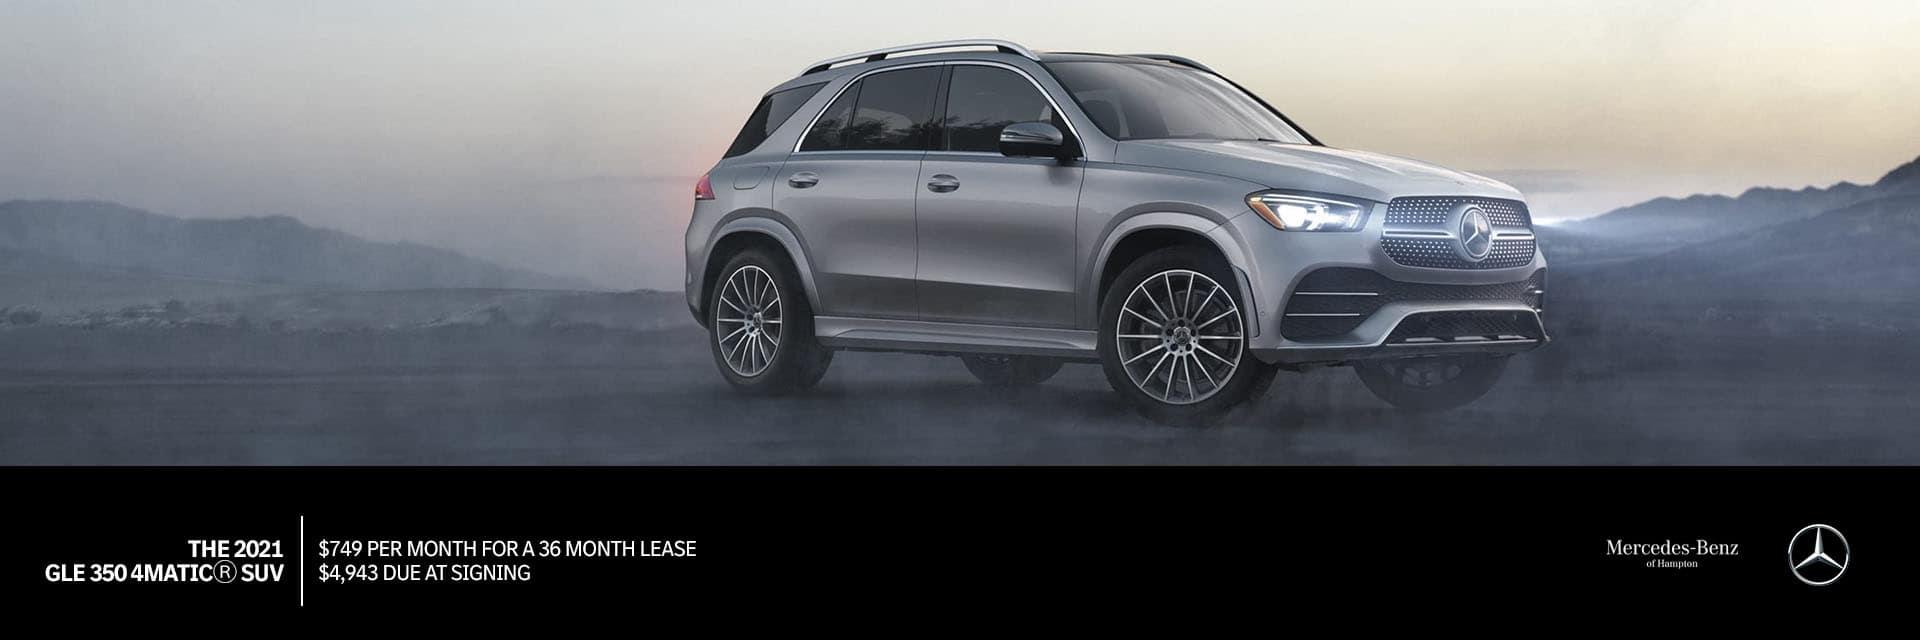 MBOH-October 20212021 GLE 350 SUV copy